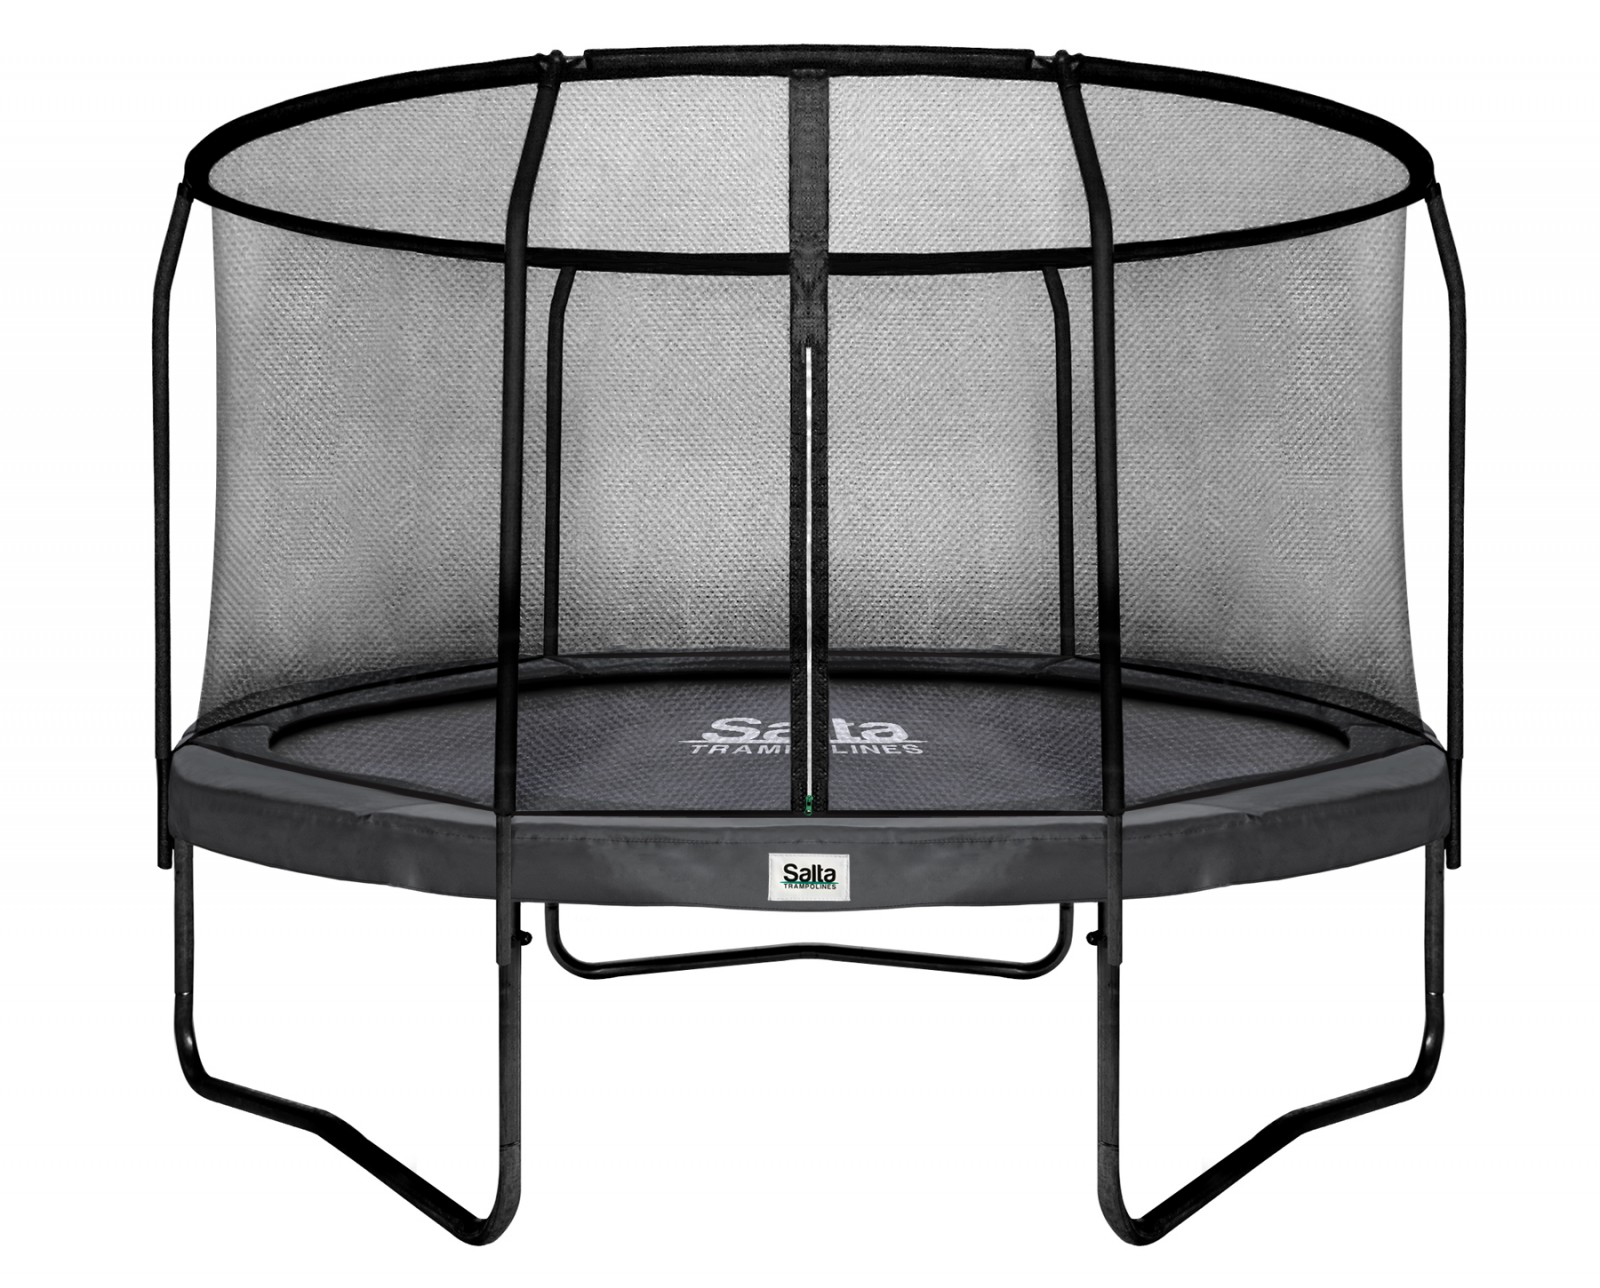 salta trampoline premium black edition buy with 15. Black Bedroom Furniture Sets. Home Design Ideas